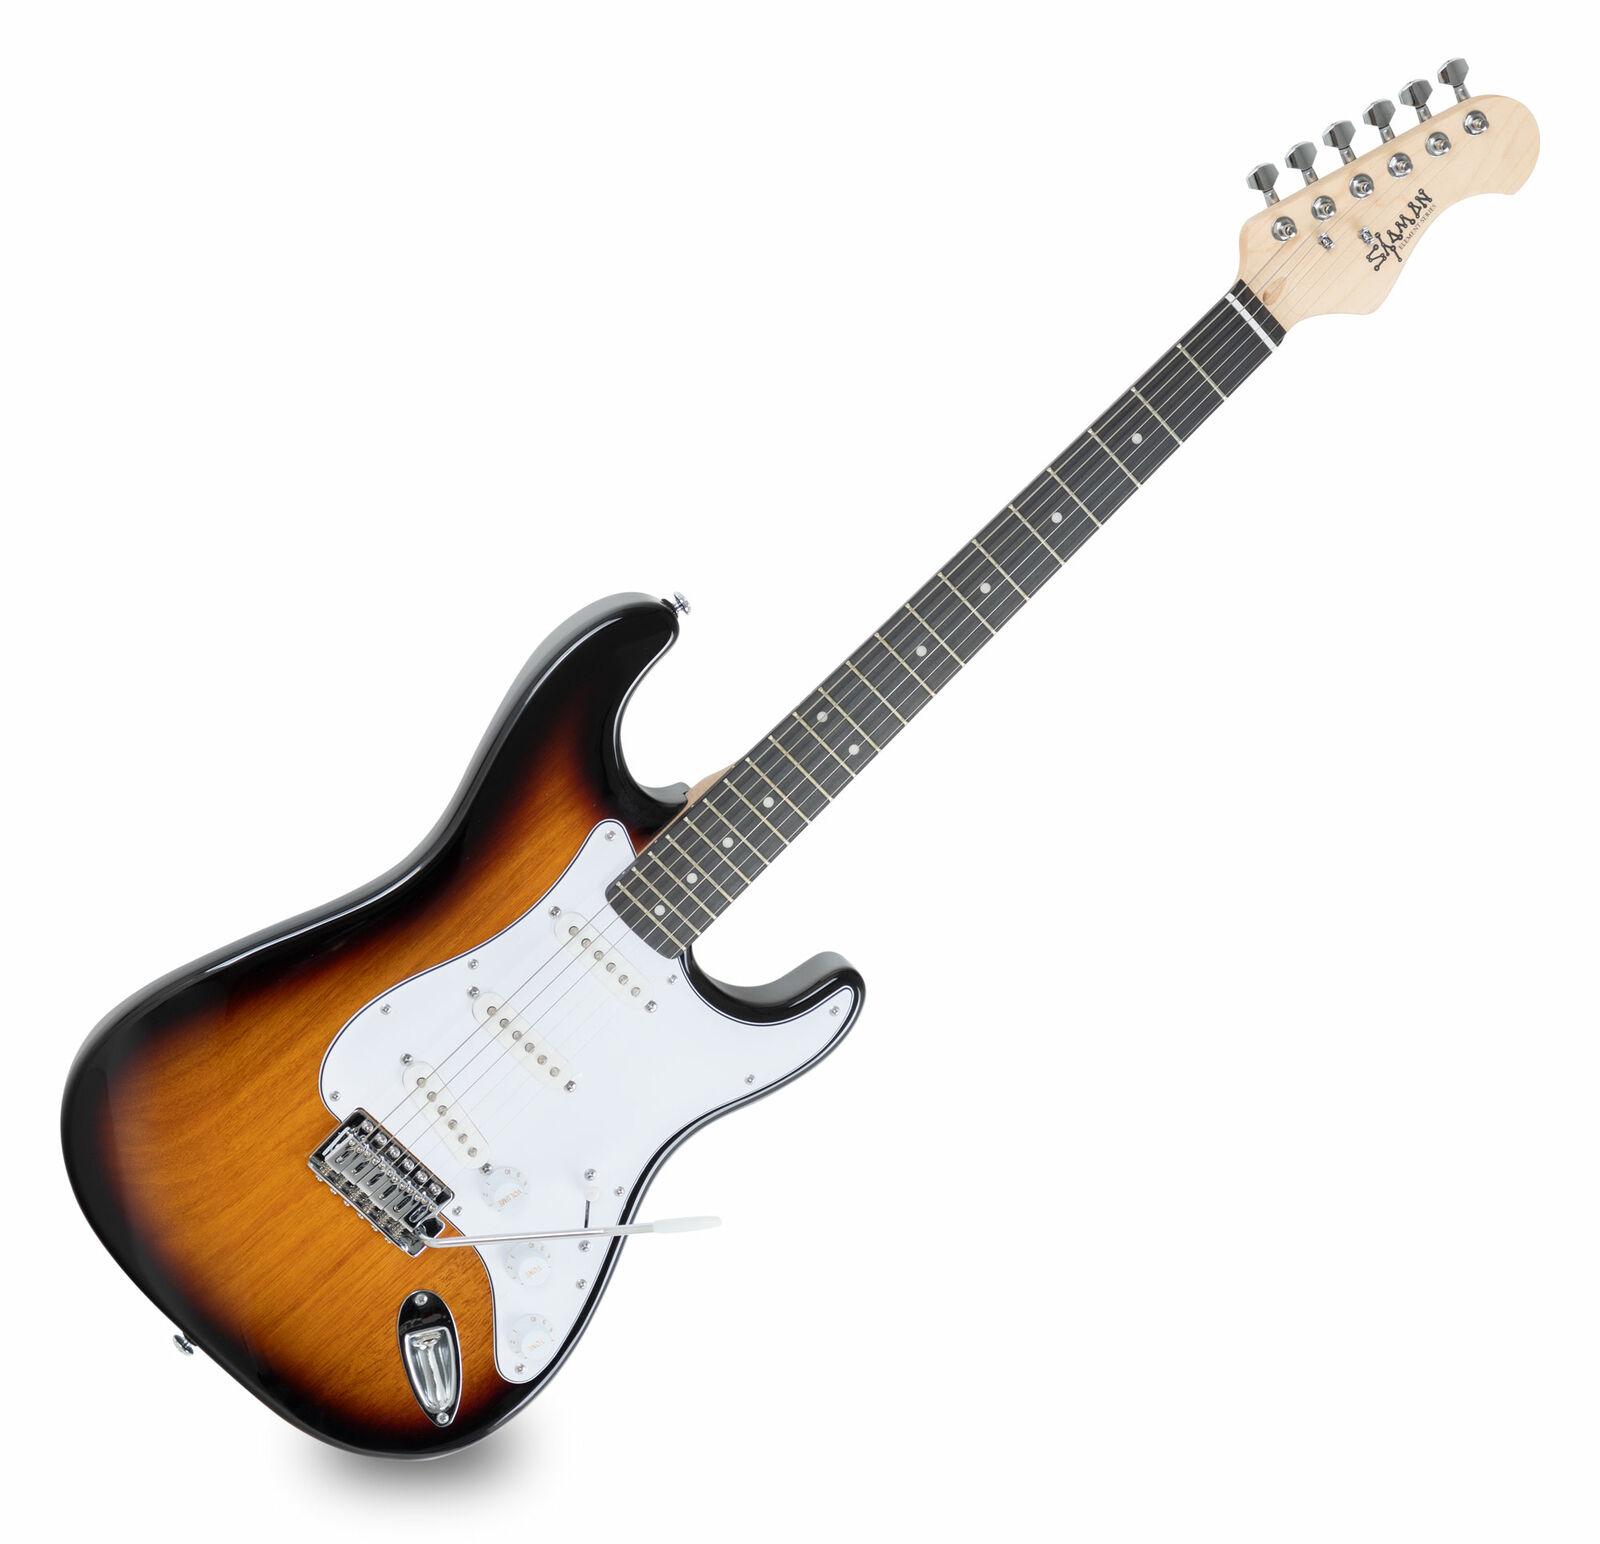 Shaman E-Gitarre ST Design Single Coil Ahorn Linde Tremolo Vintage Sunburst